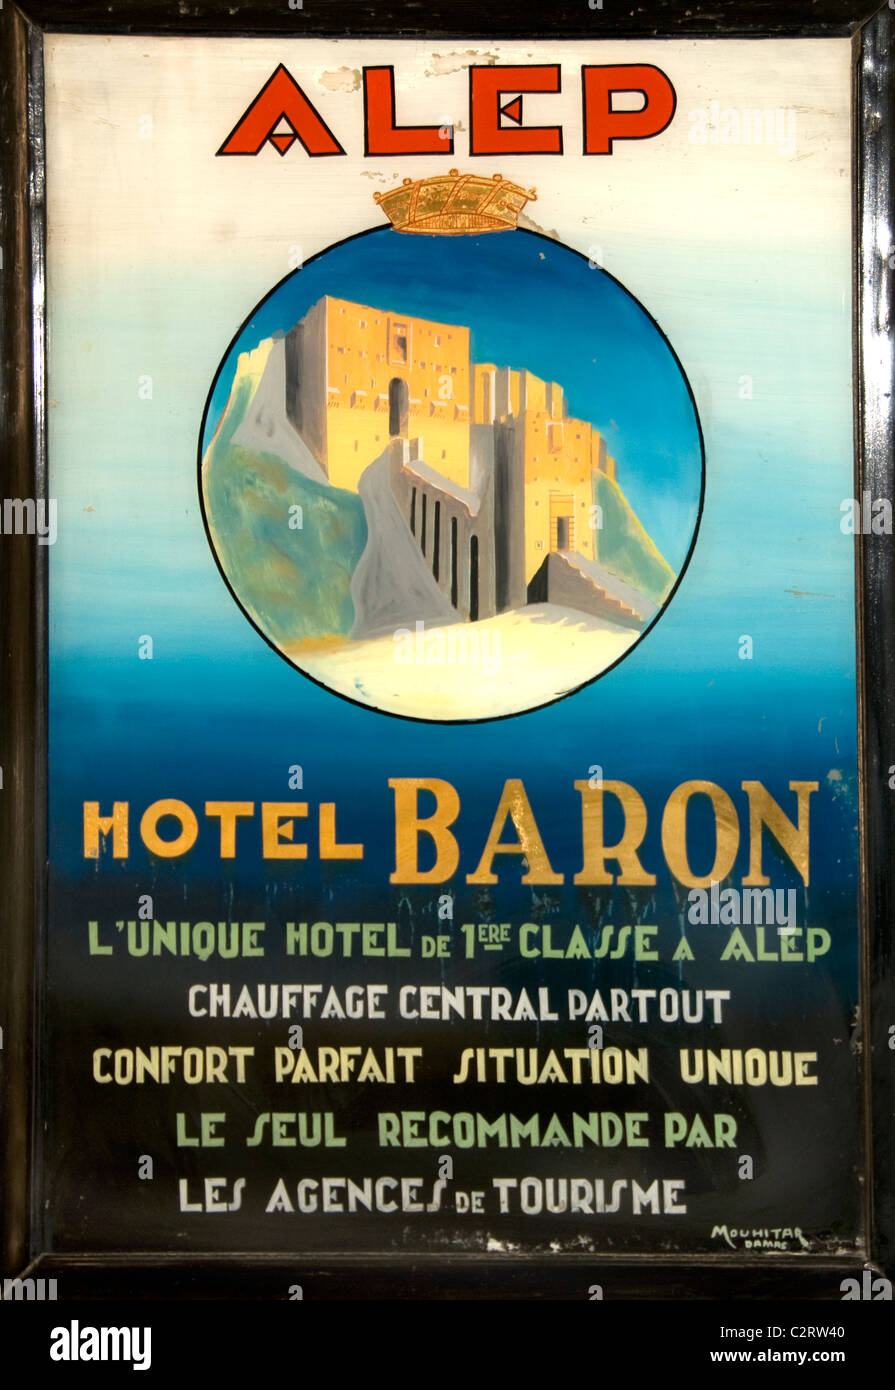 Hotel Baron Aleppo Bar Pub Syria Syrian famous Guest Agatha Christie T E Lawrence  Mustafa Kemal Ataturk - Stock Image